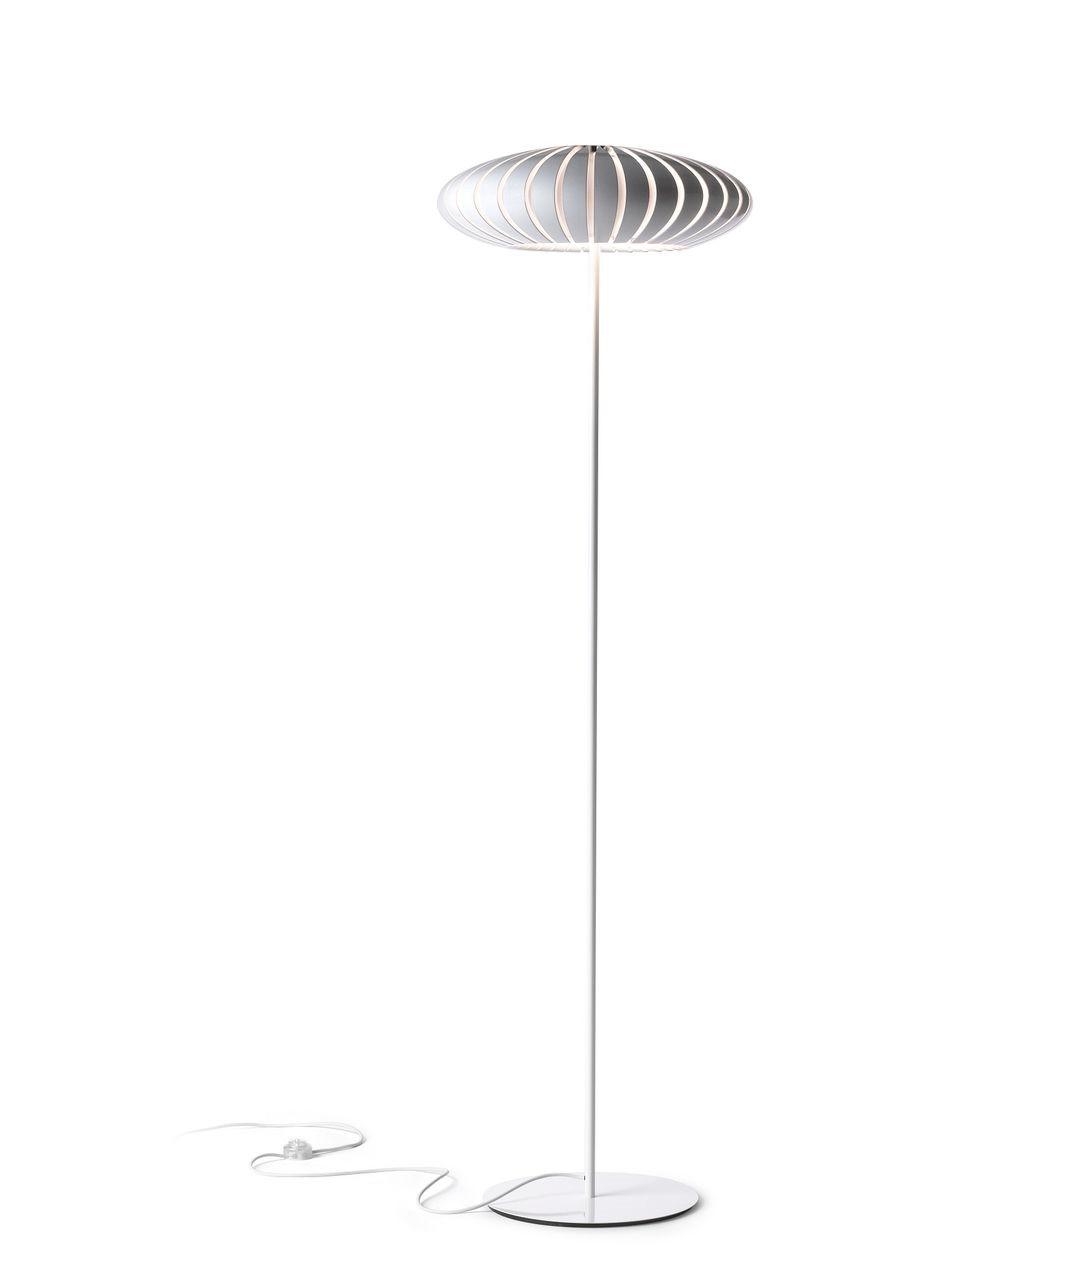 Image of   Maranga Gulvlampe Small Hvid - Marset